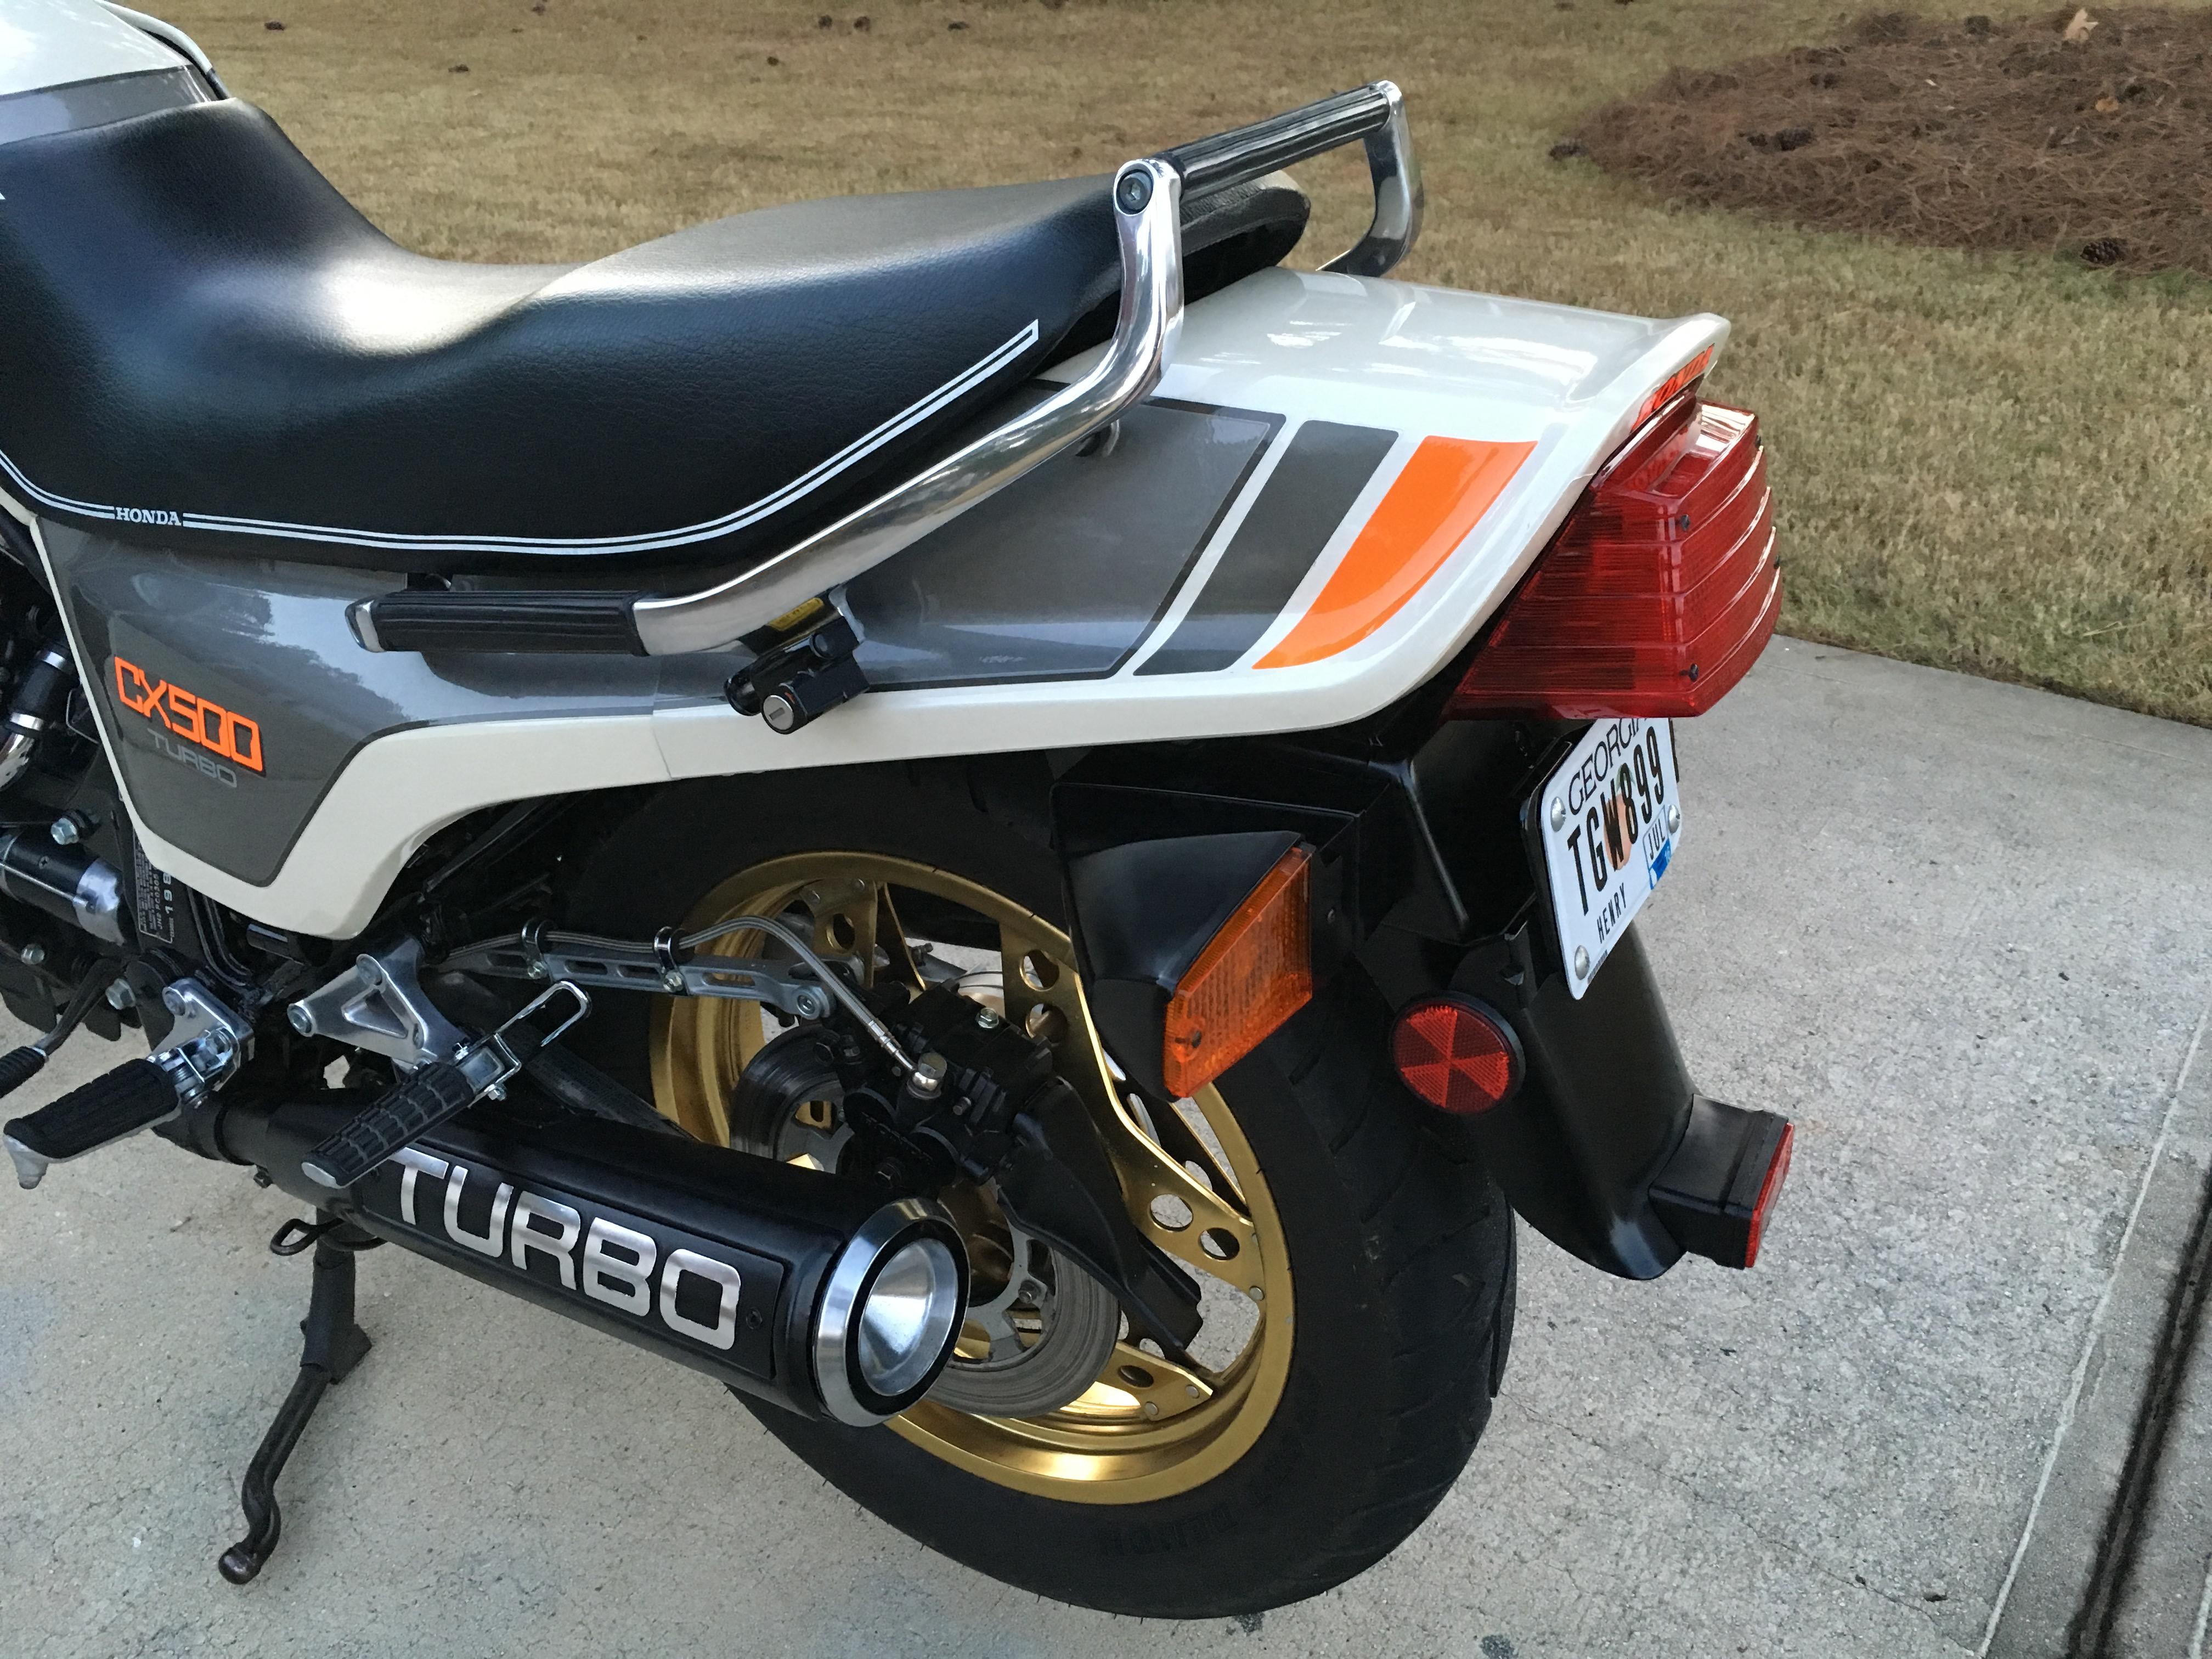 CX500TC stumbles bucks then dies, will not stay running, literally